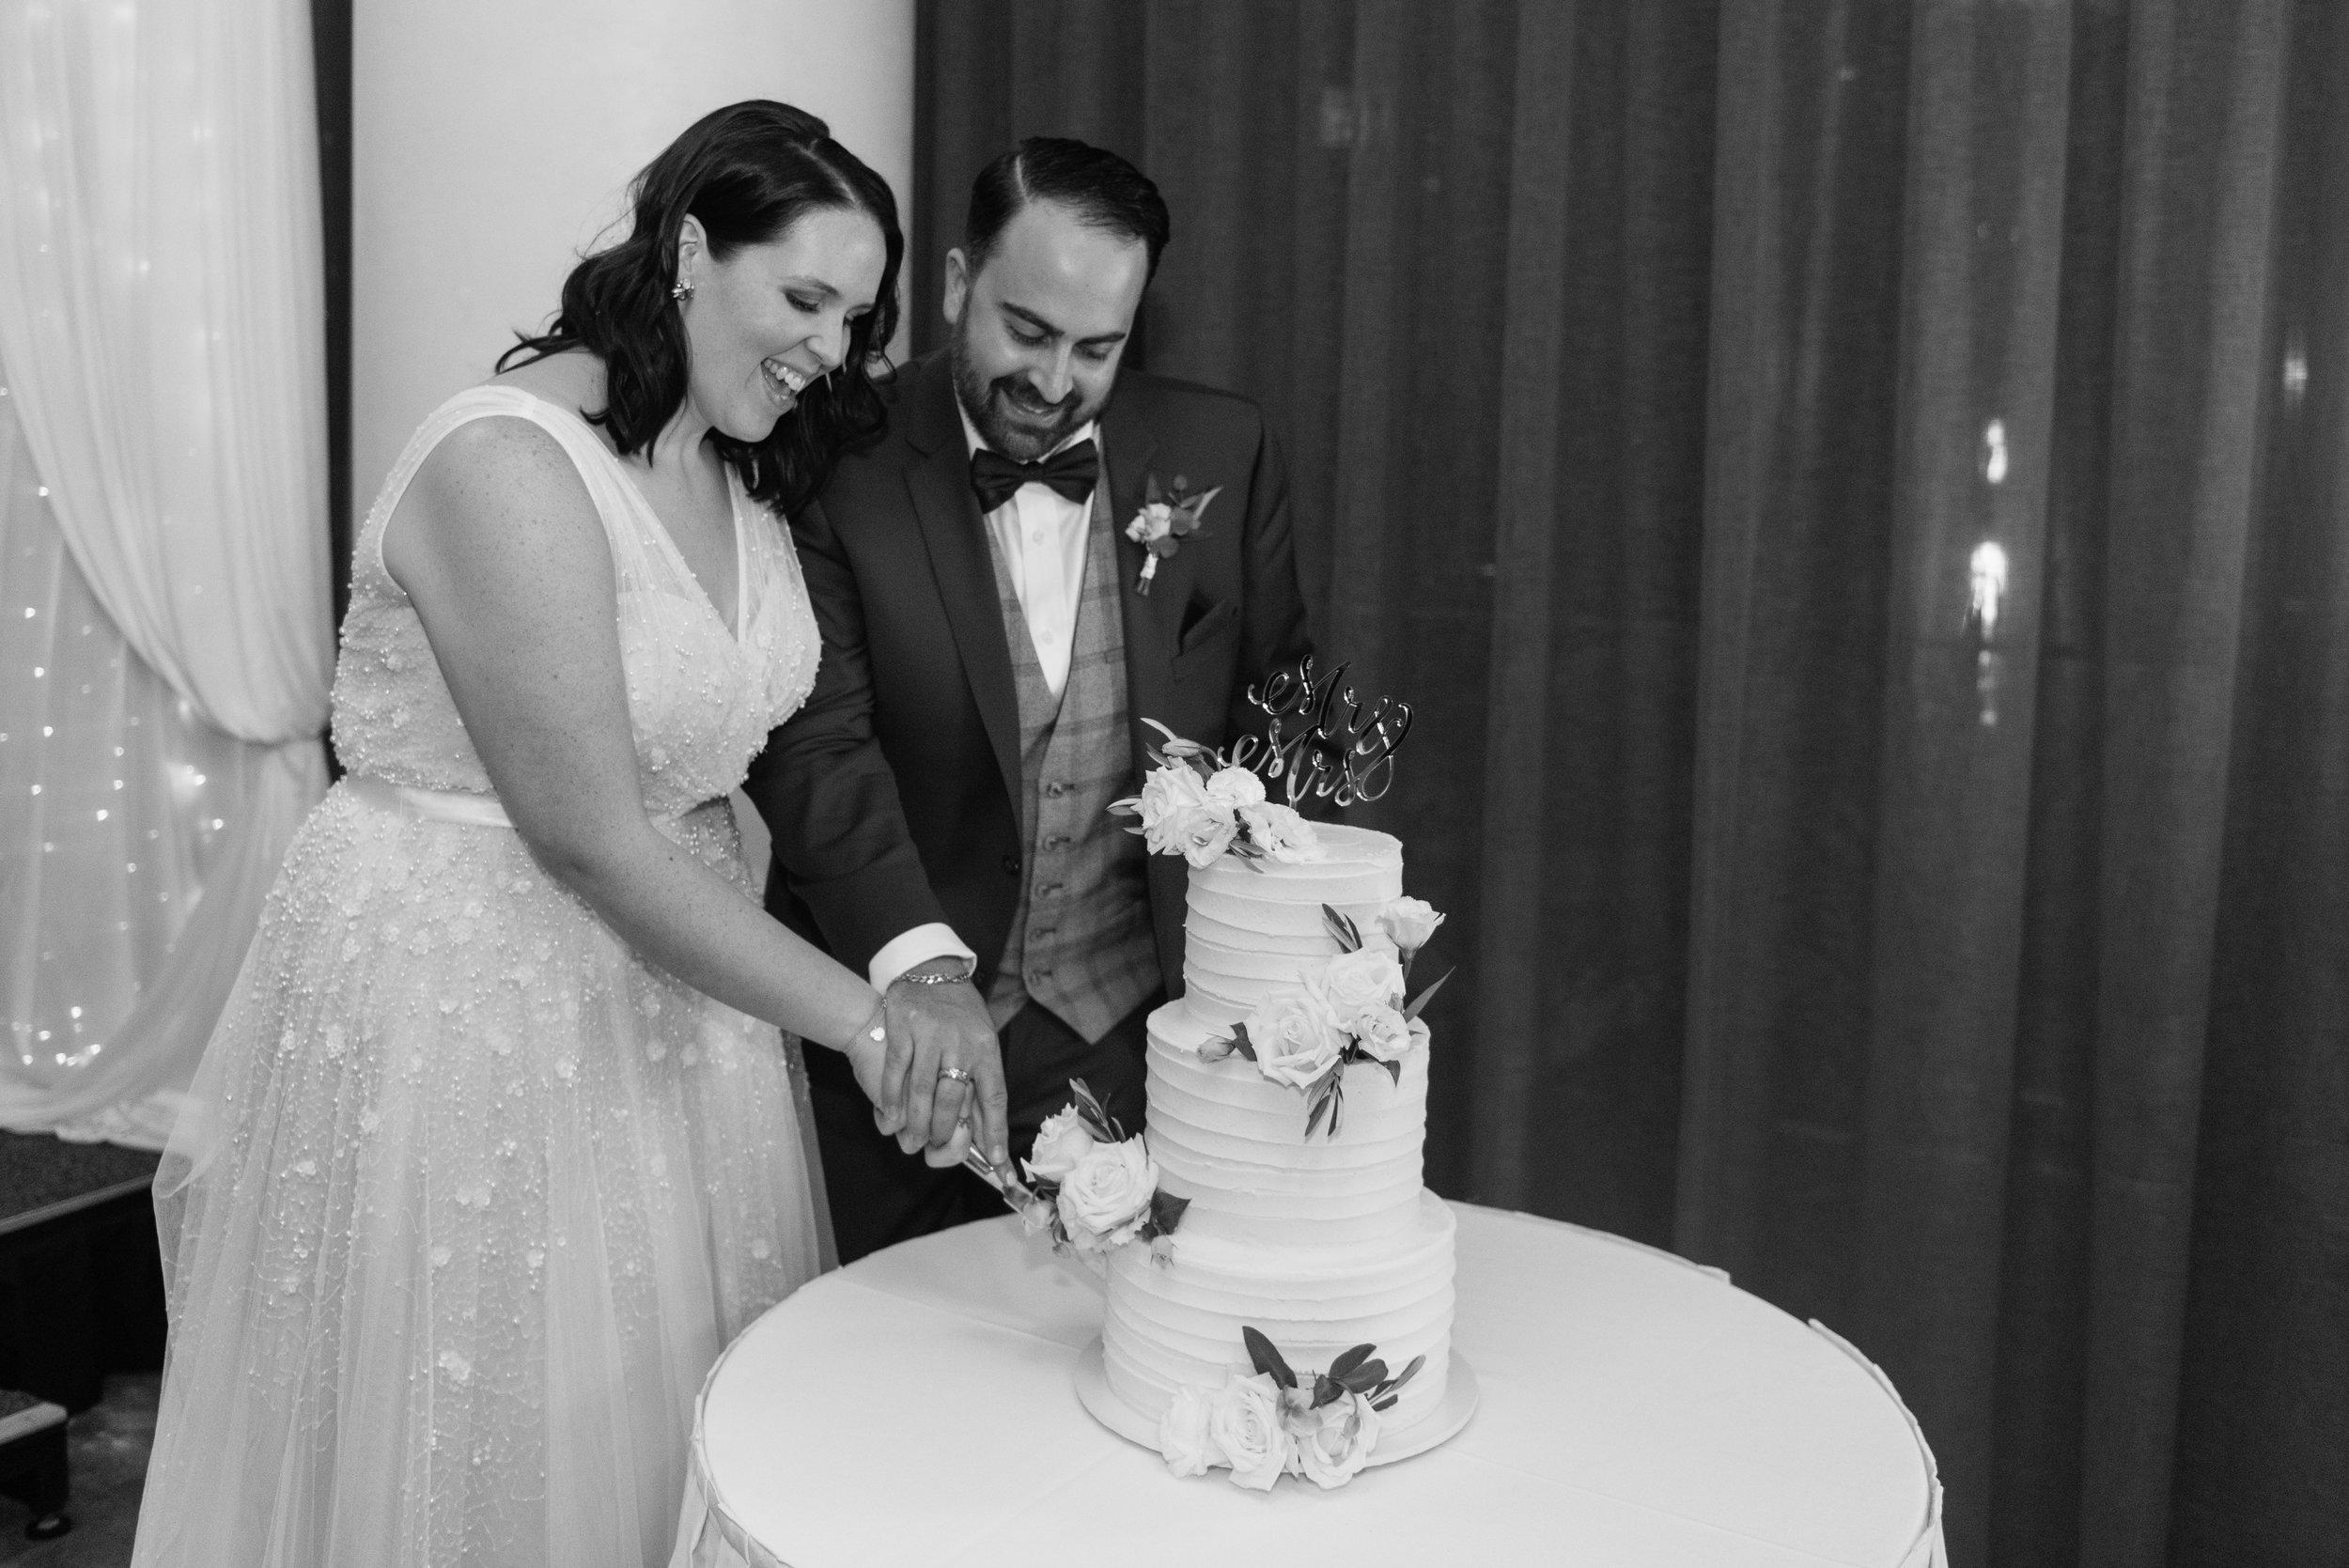 brisbane-city-wedding-photographer-romantic-wedding-113.jpg